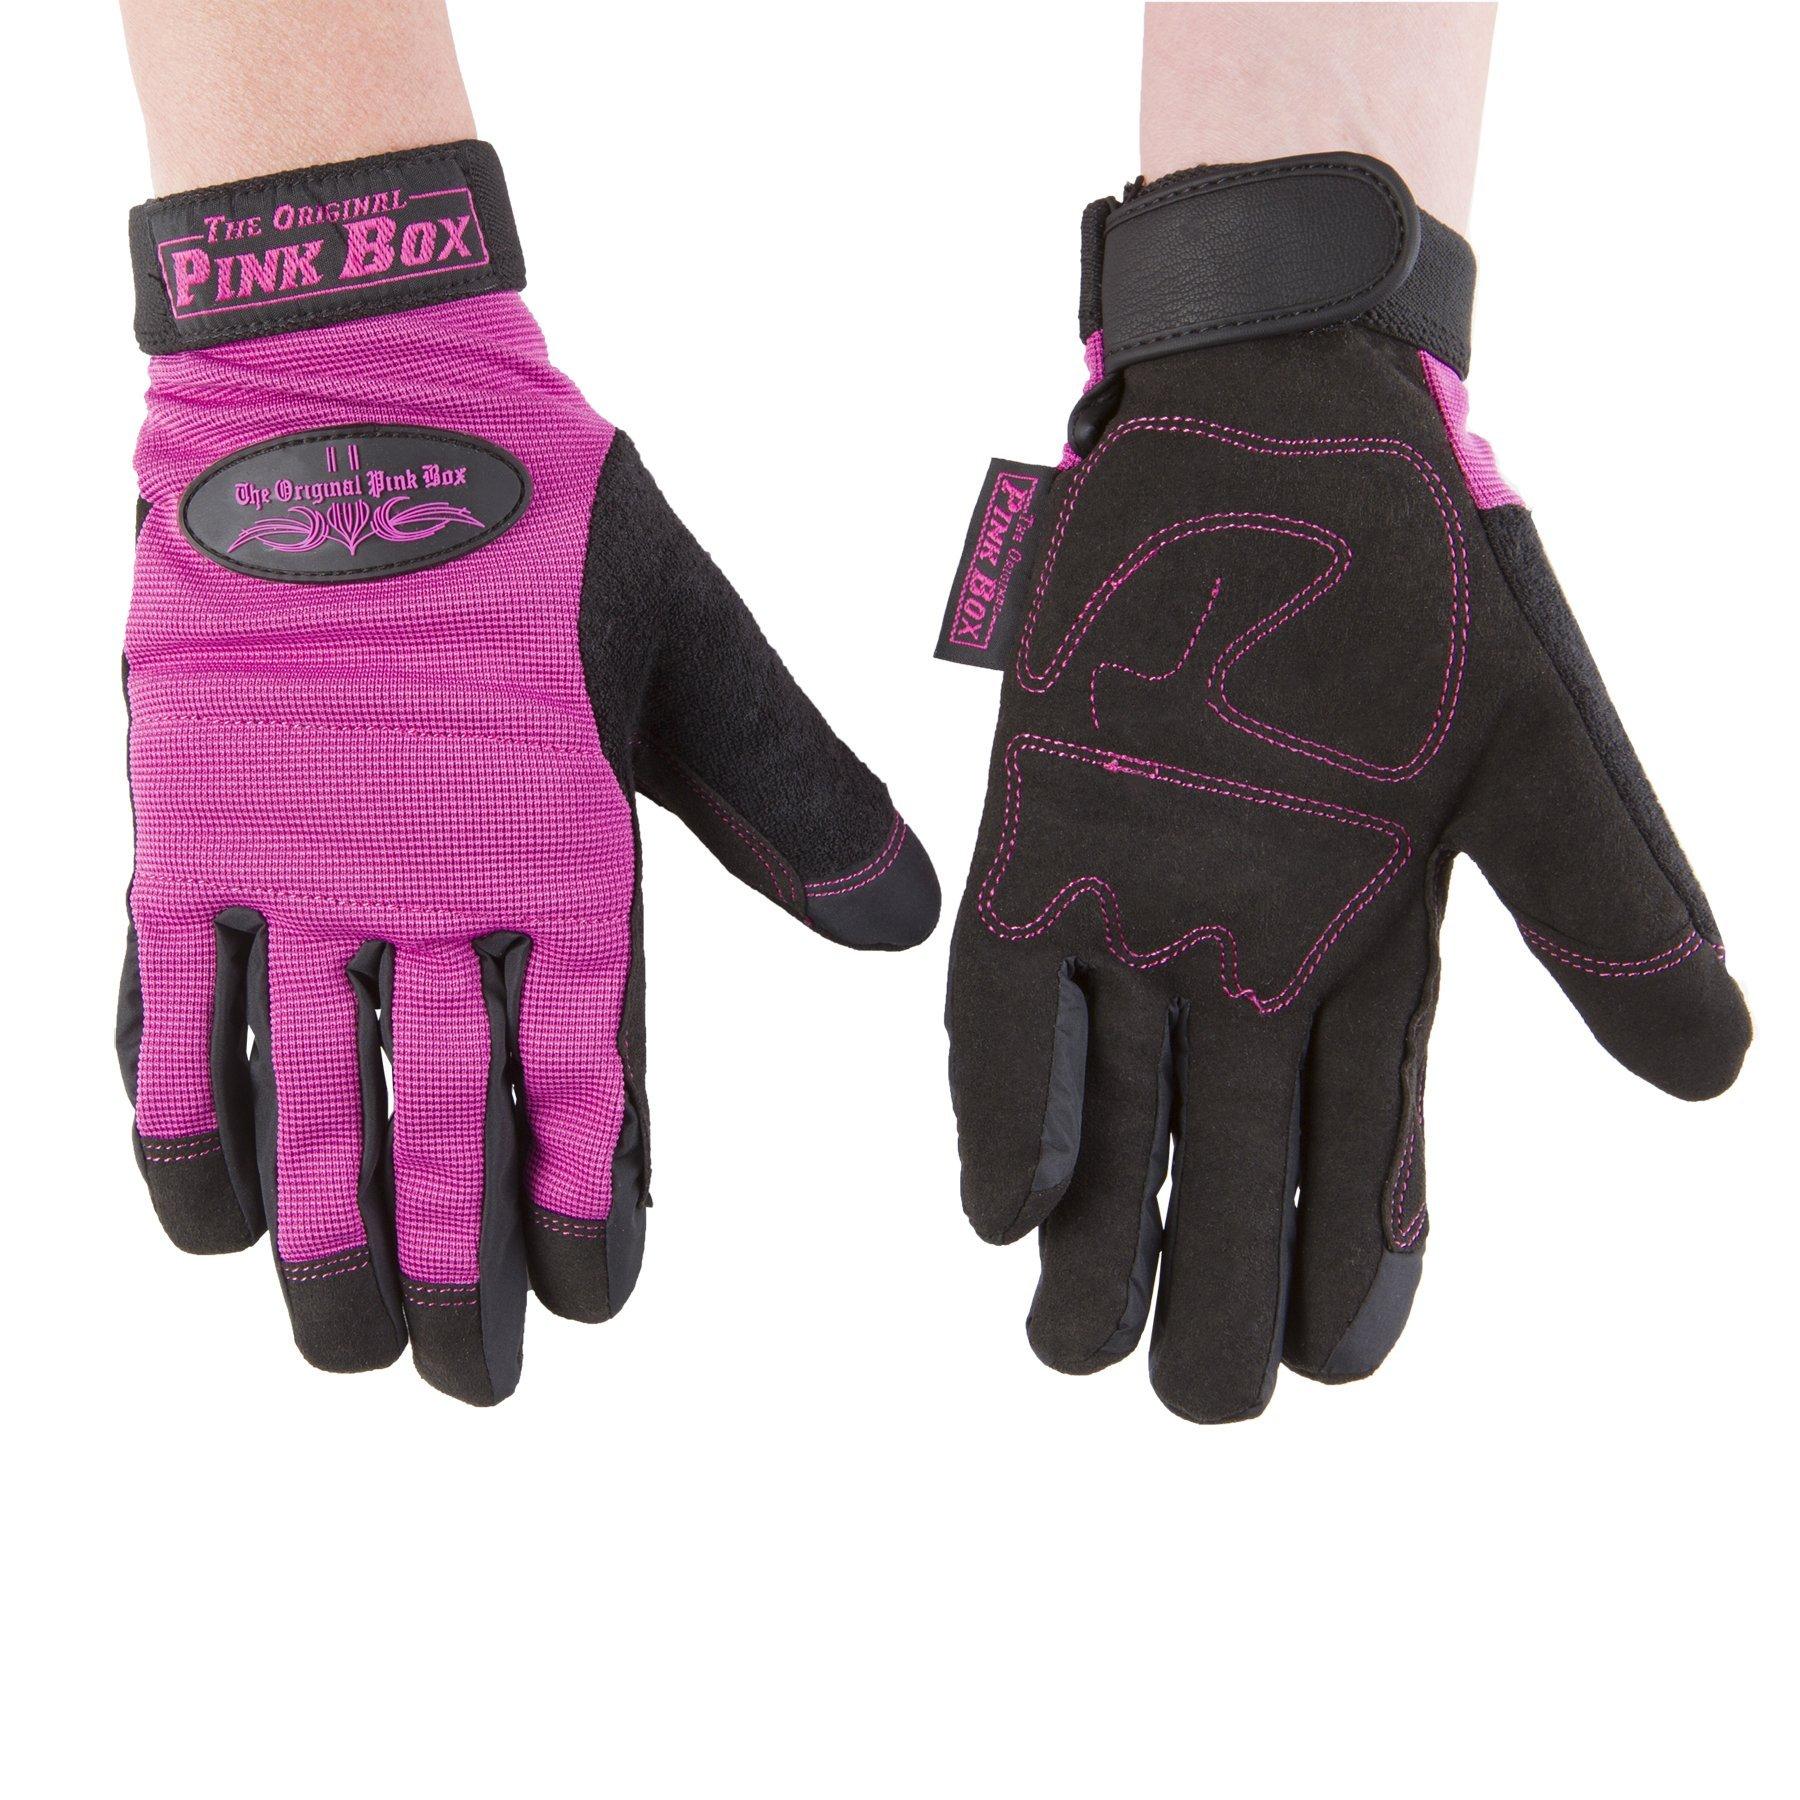 The Original Pink Box PBGL Multi-Purpose Gloves, Large, Pink